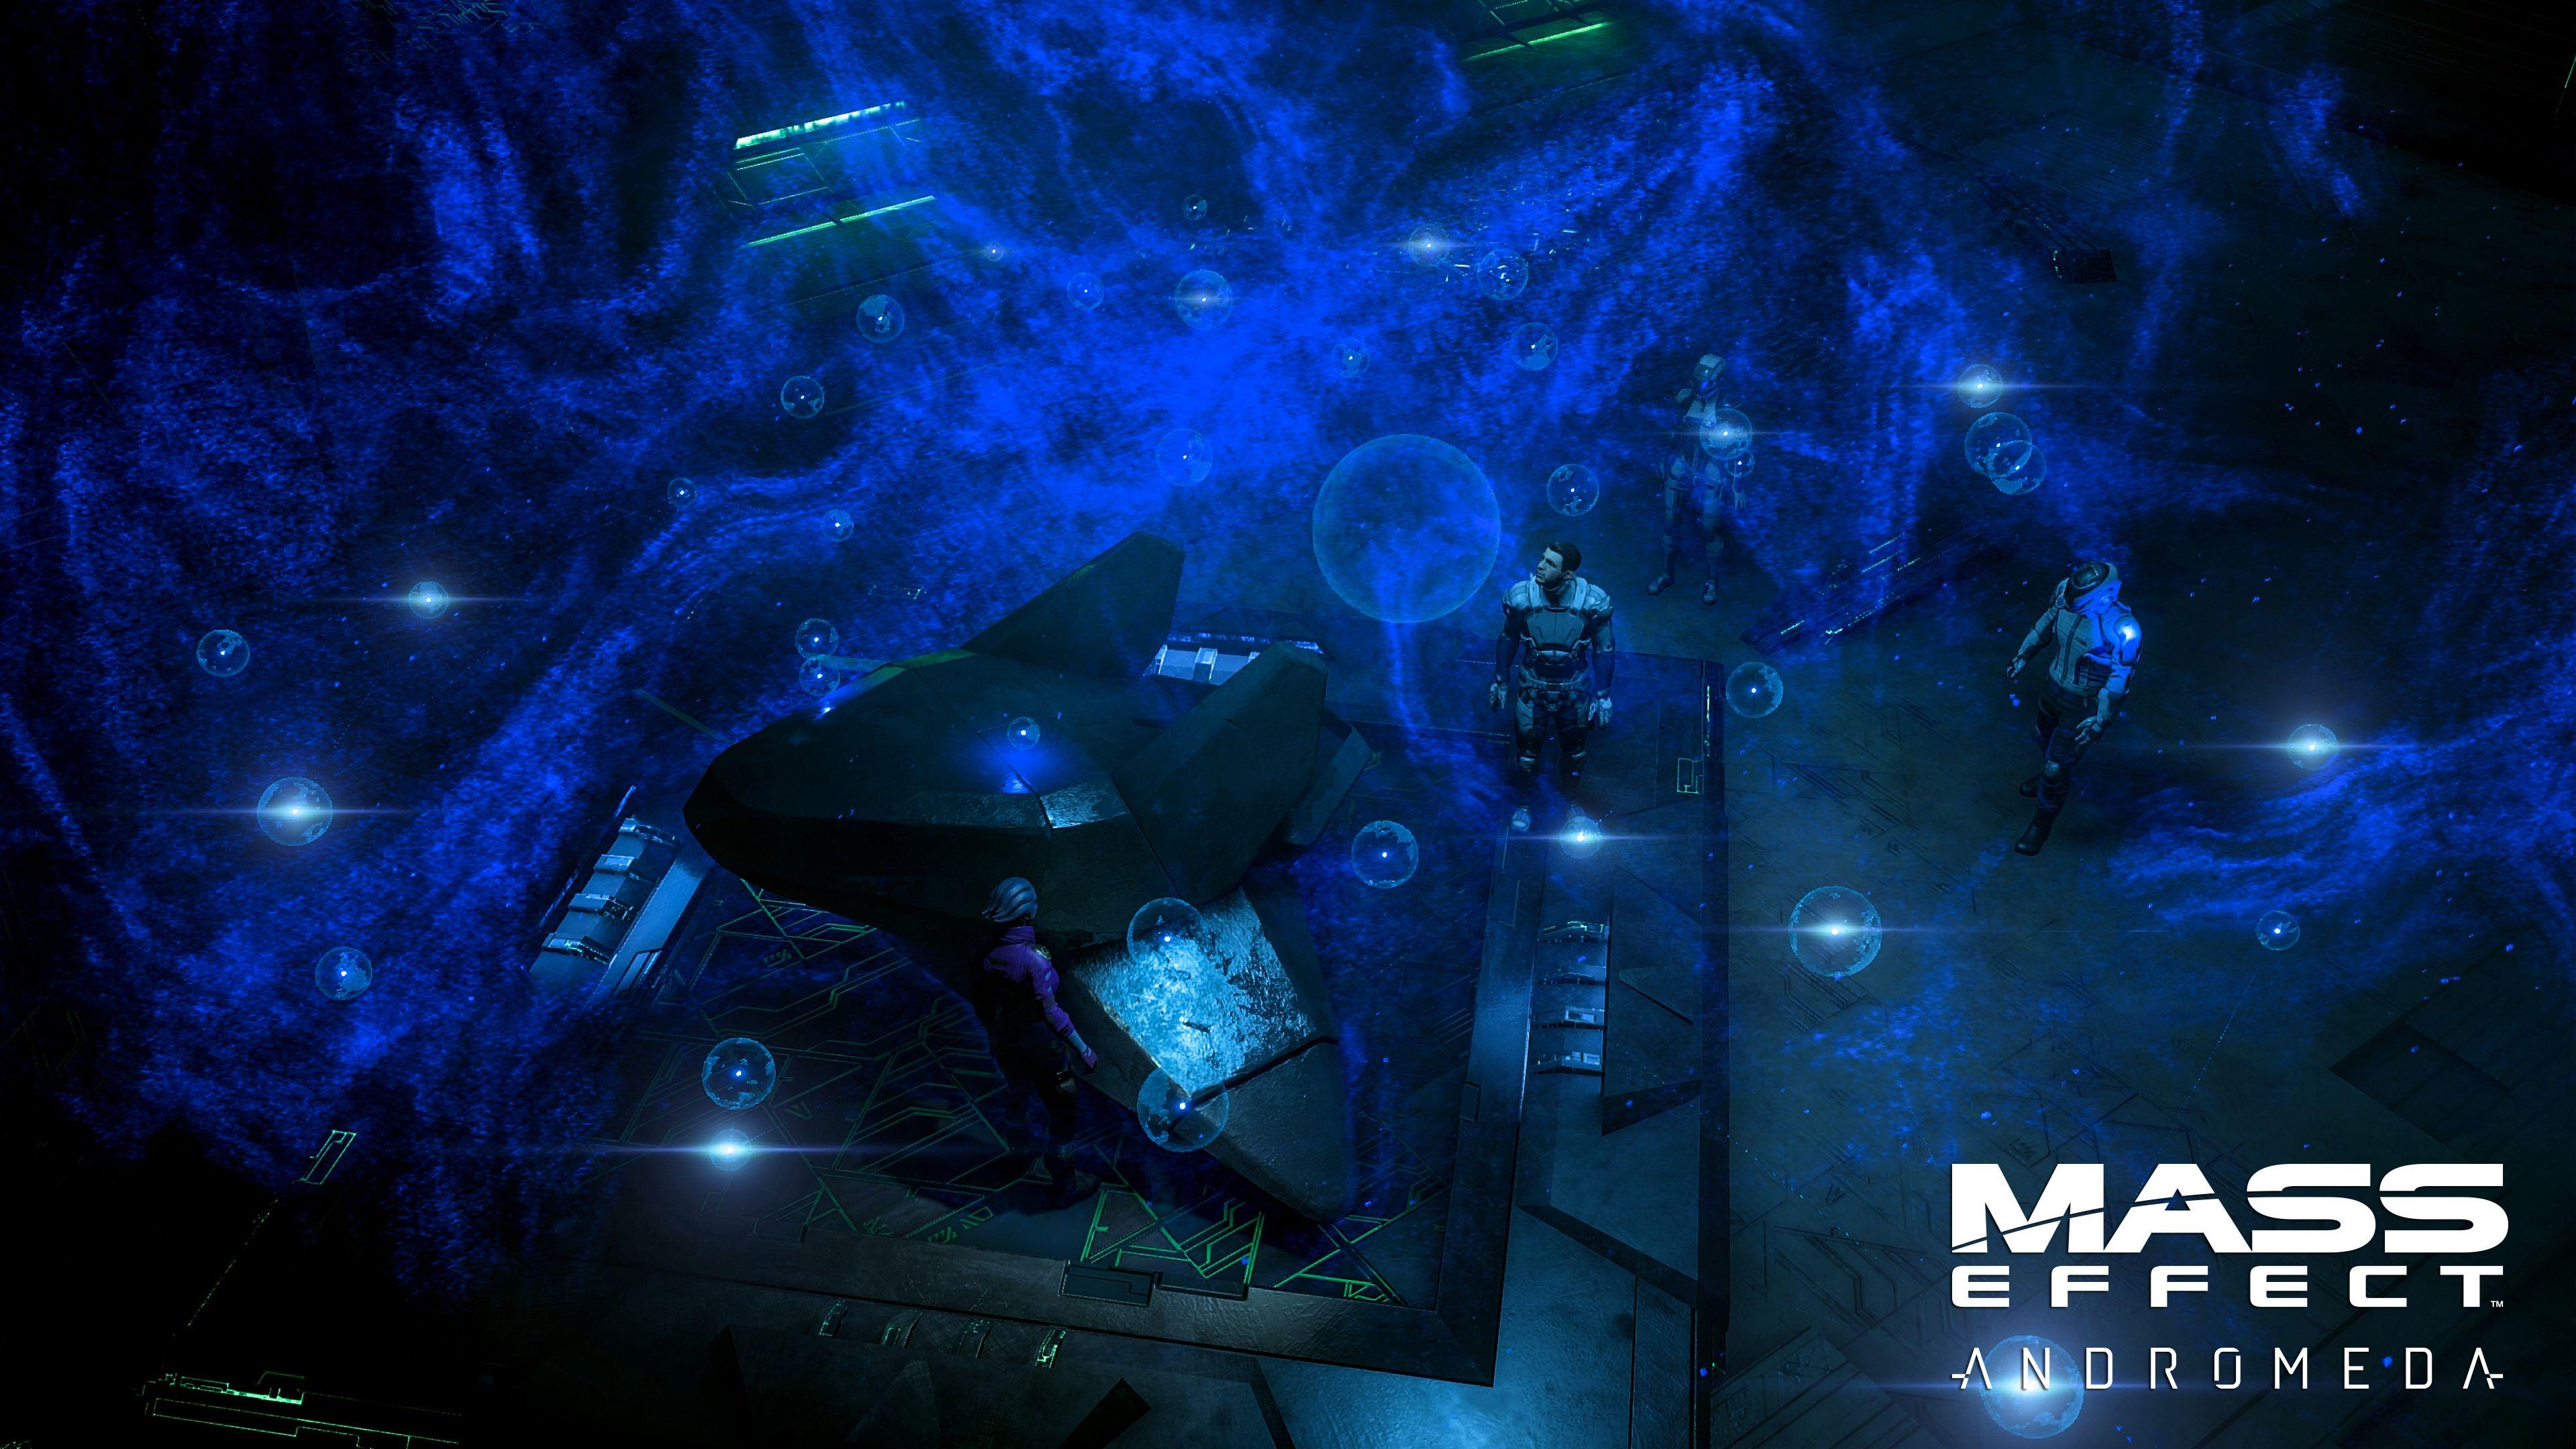 Mass Effect Andromeda (PC) - 5